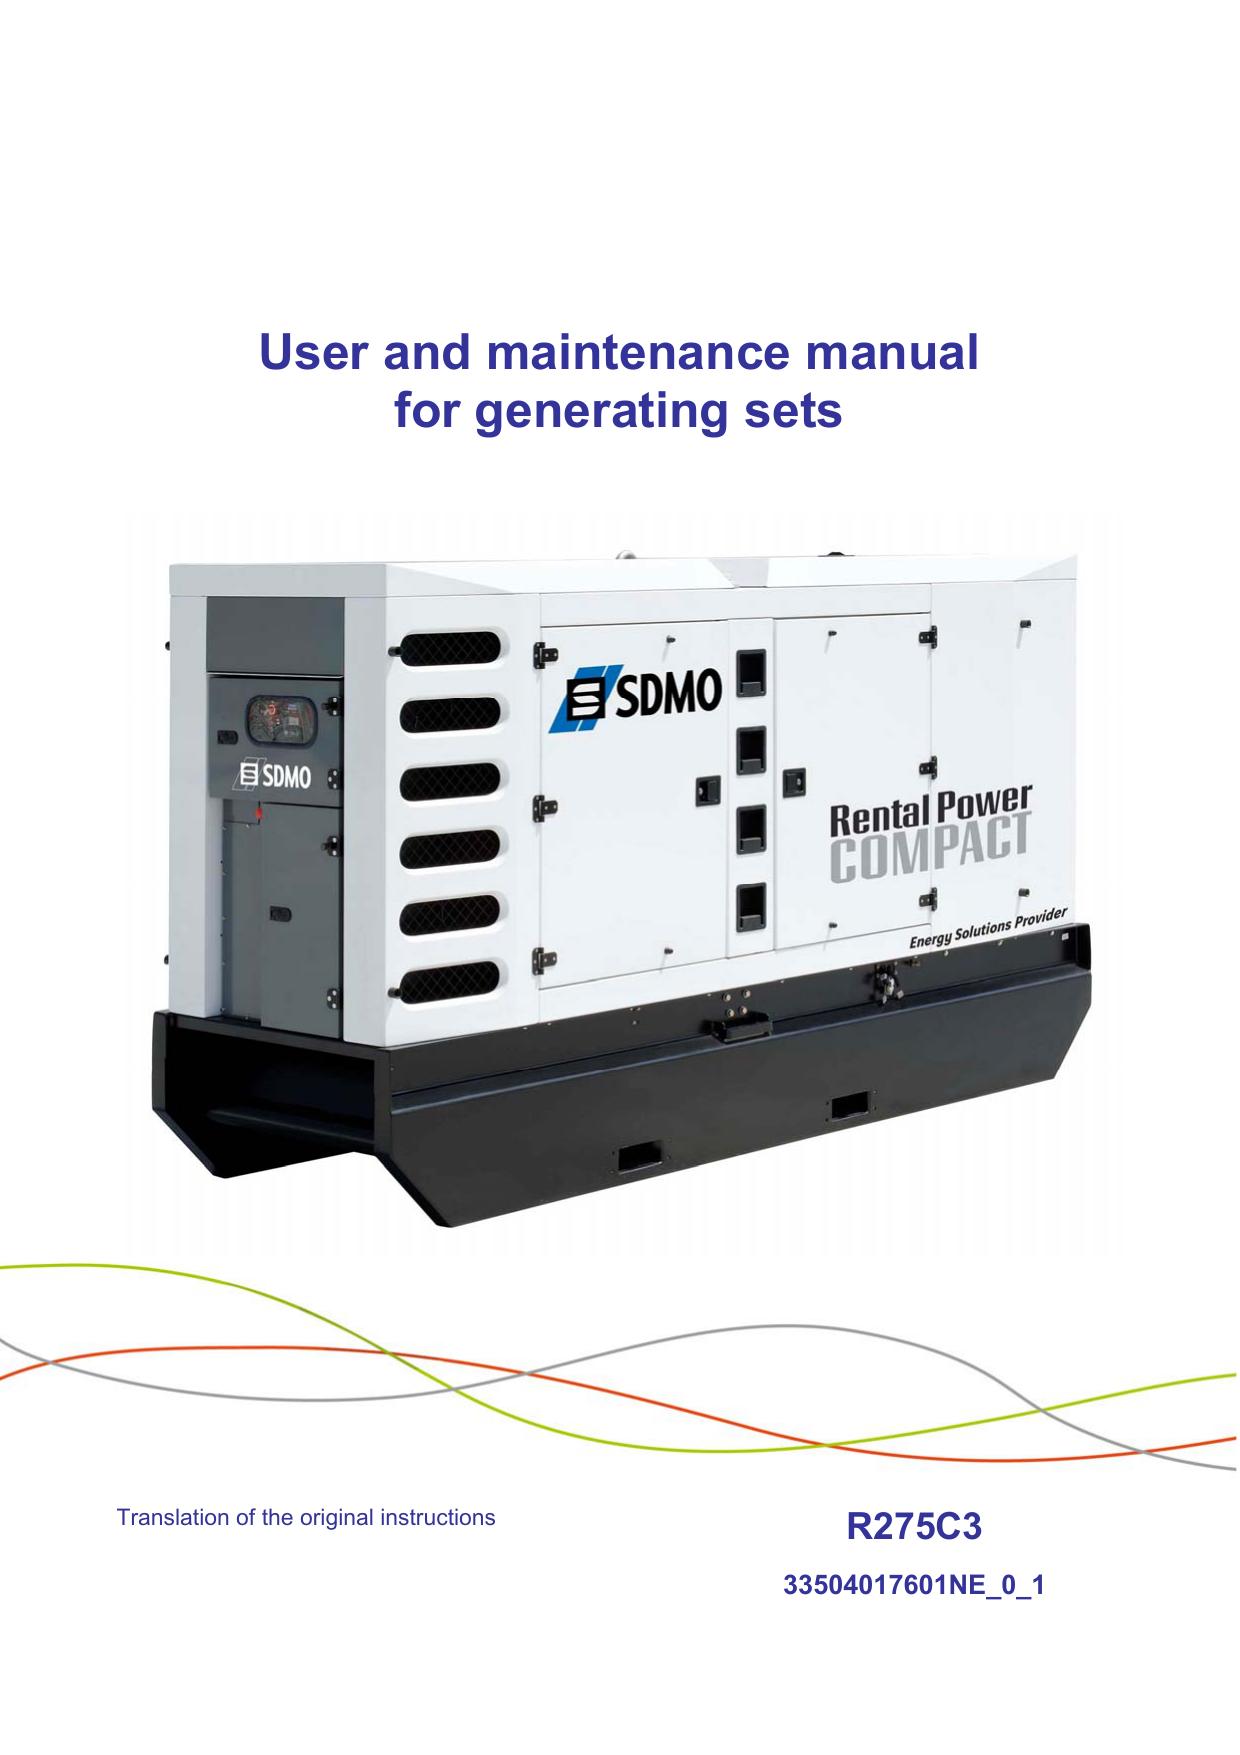 Generating set R275C3 (CE) - User manual | manualzz com